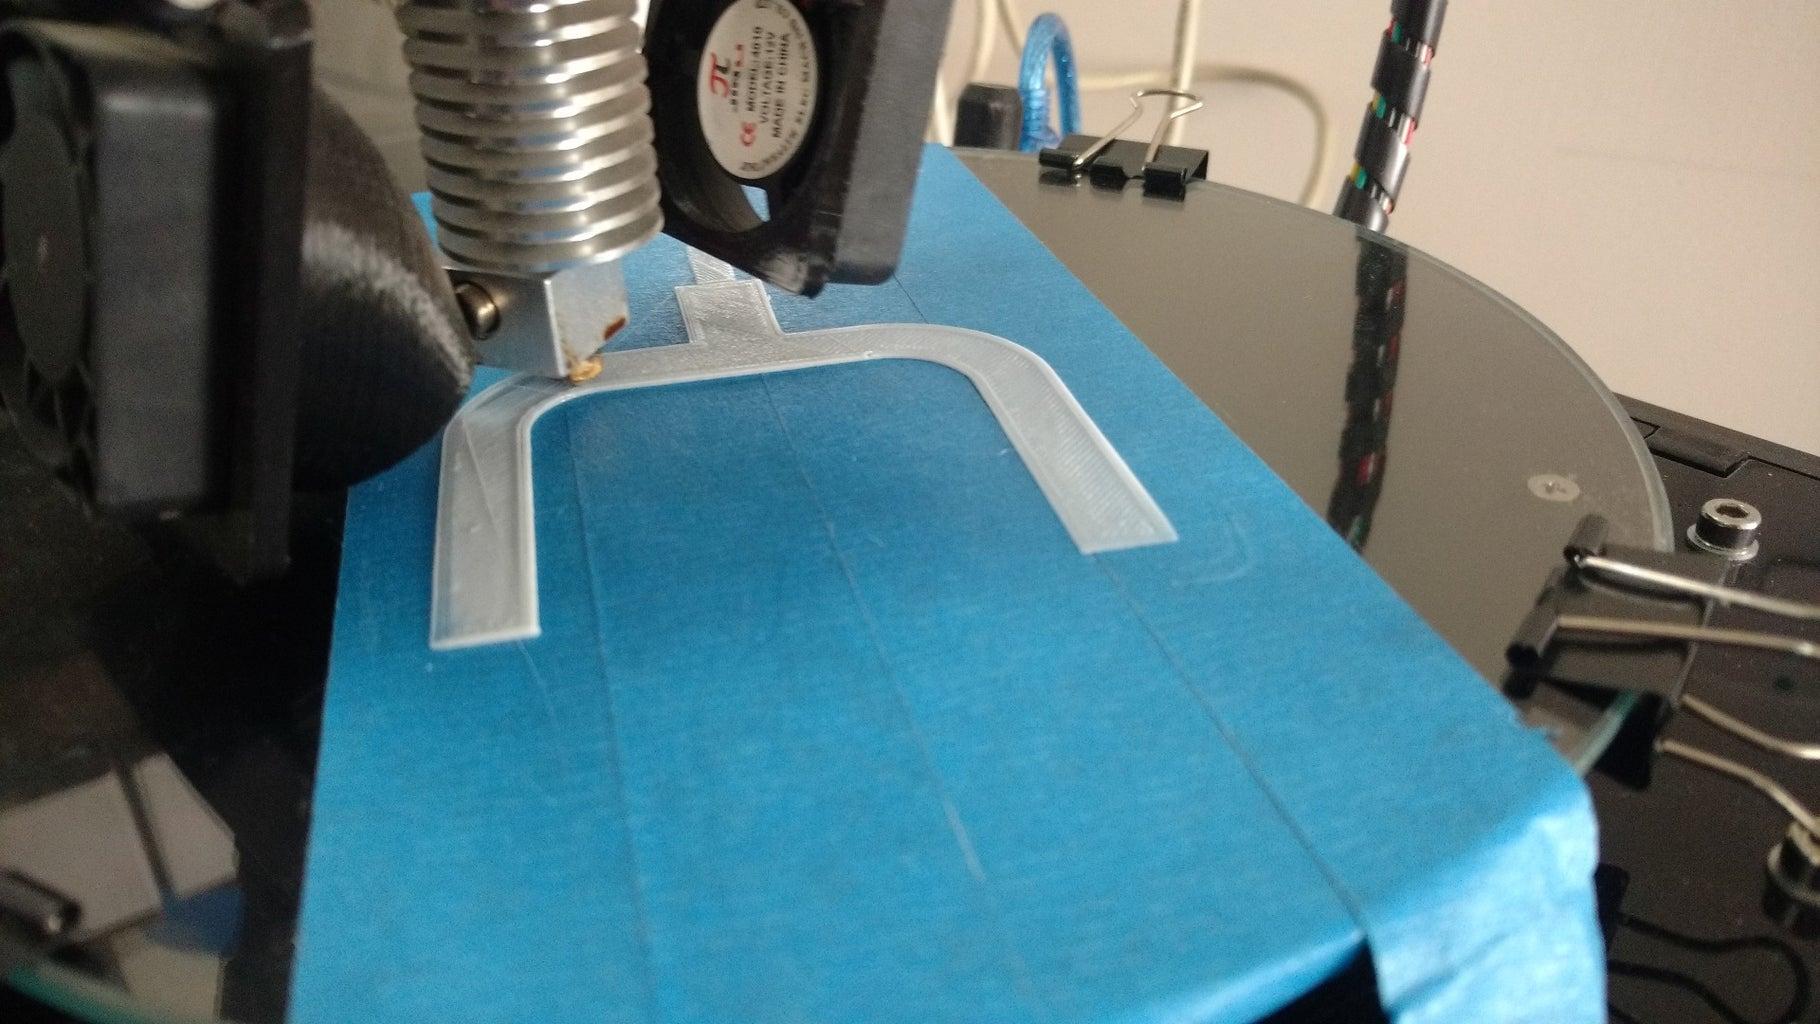 Spooler Completo Con Filamento Montado / Spooler Complete With Mounted Filament: